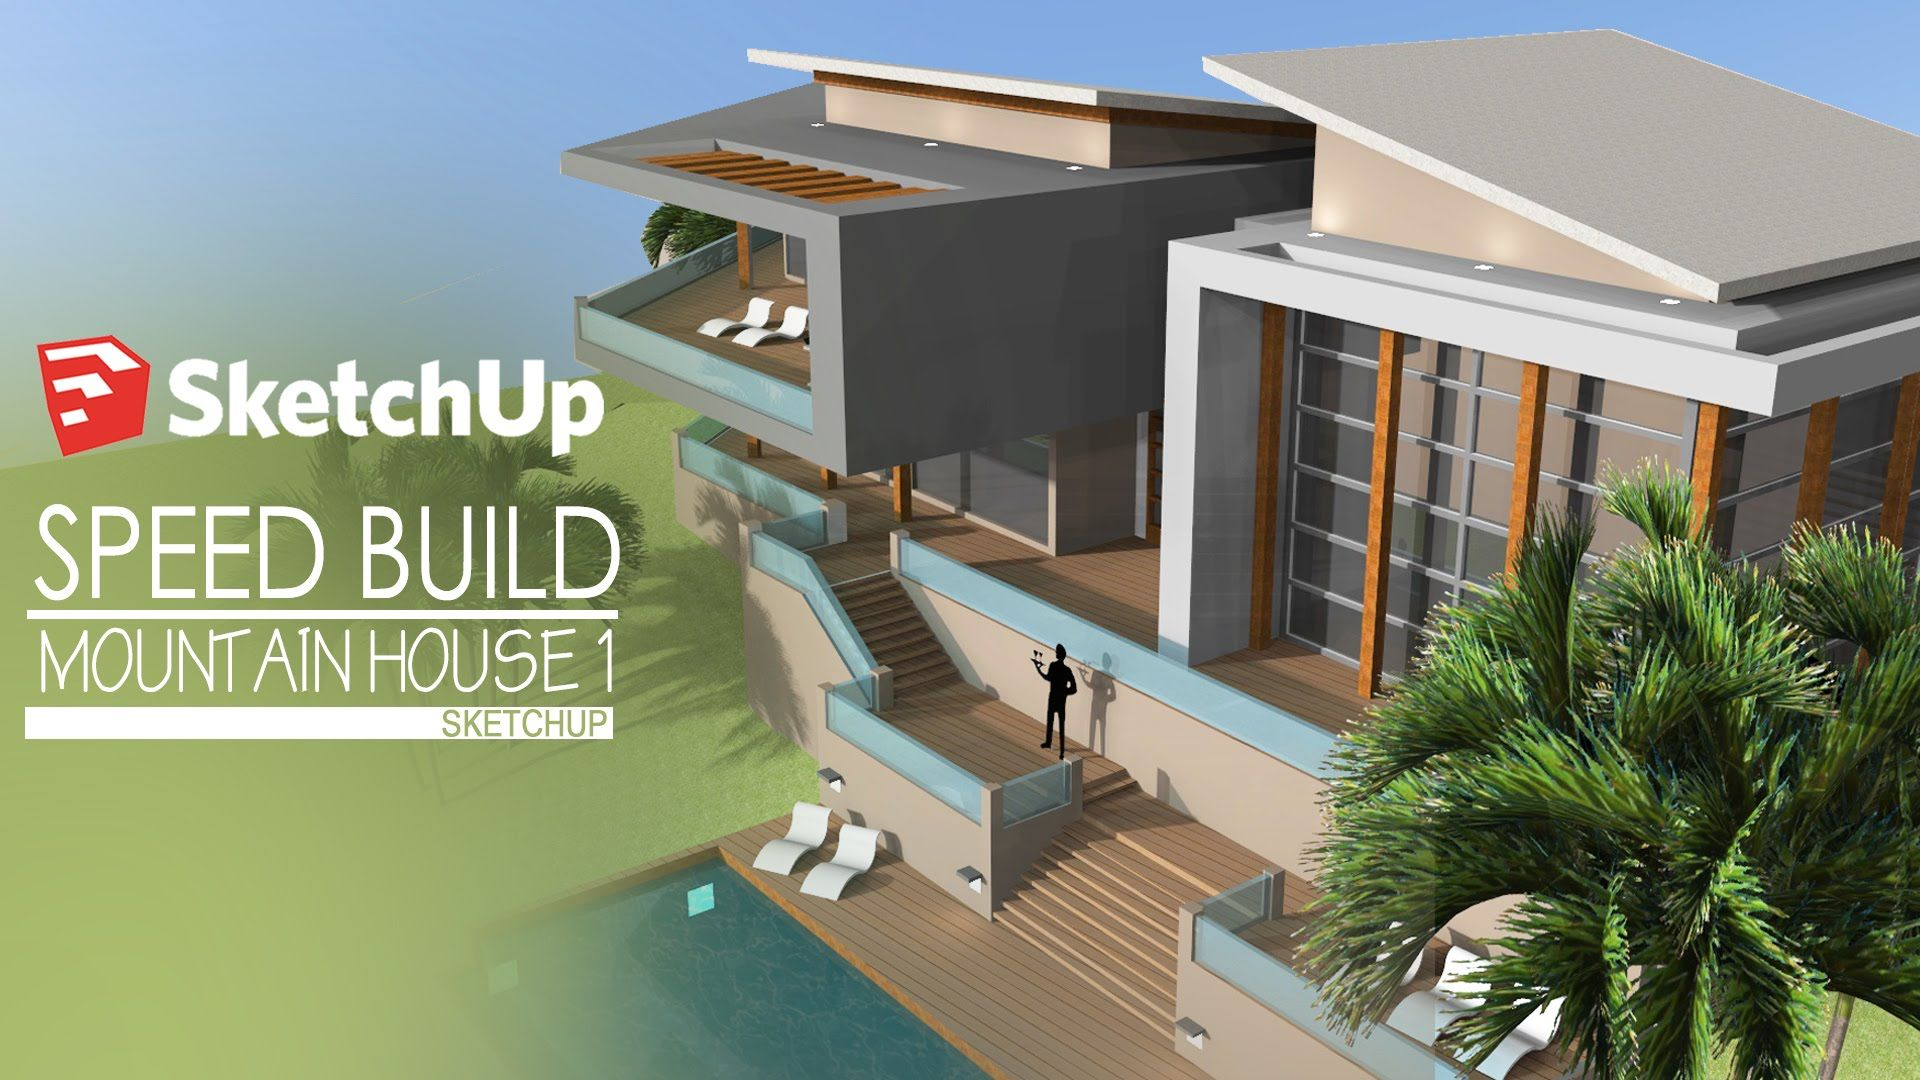 Sketchup Speed Build Modern Mountain House 1 Mountain House